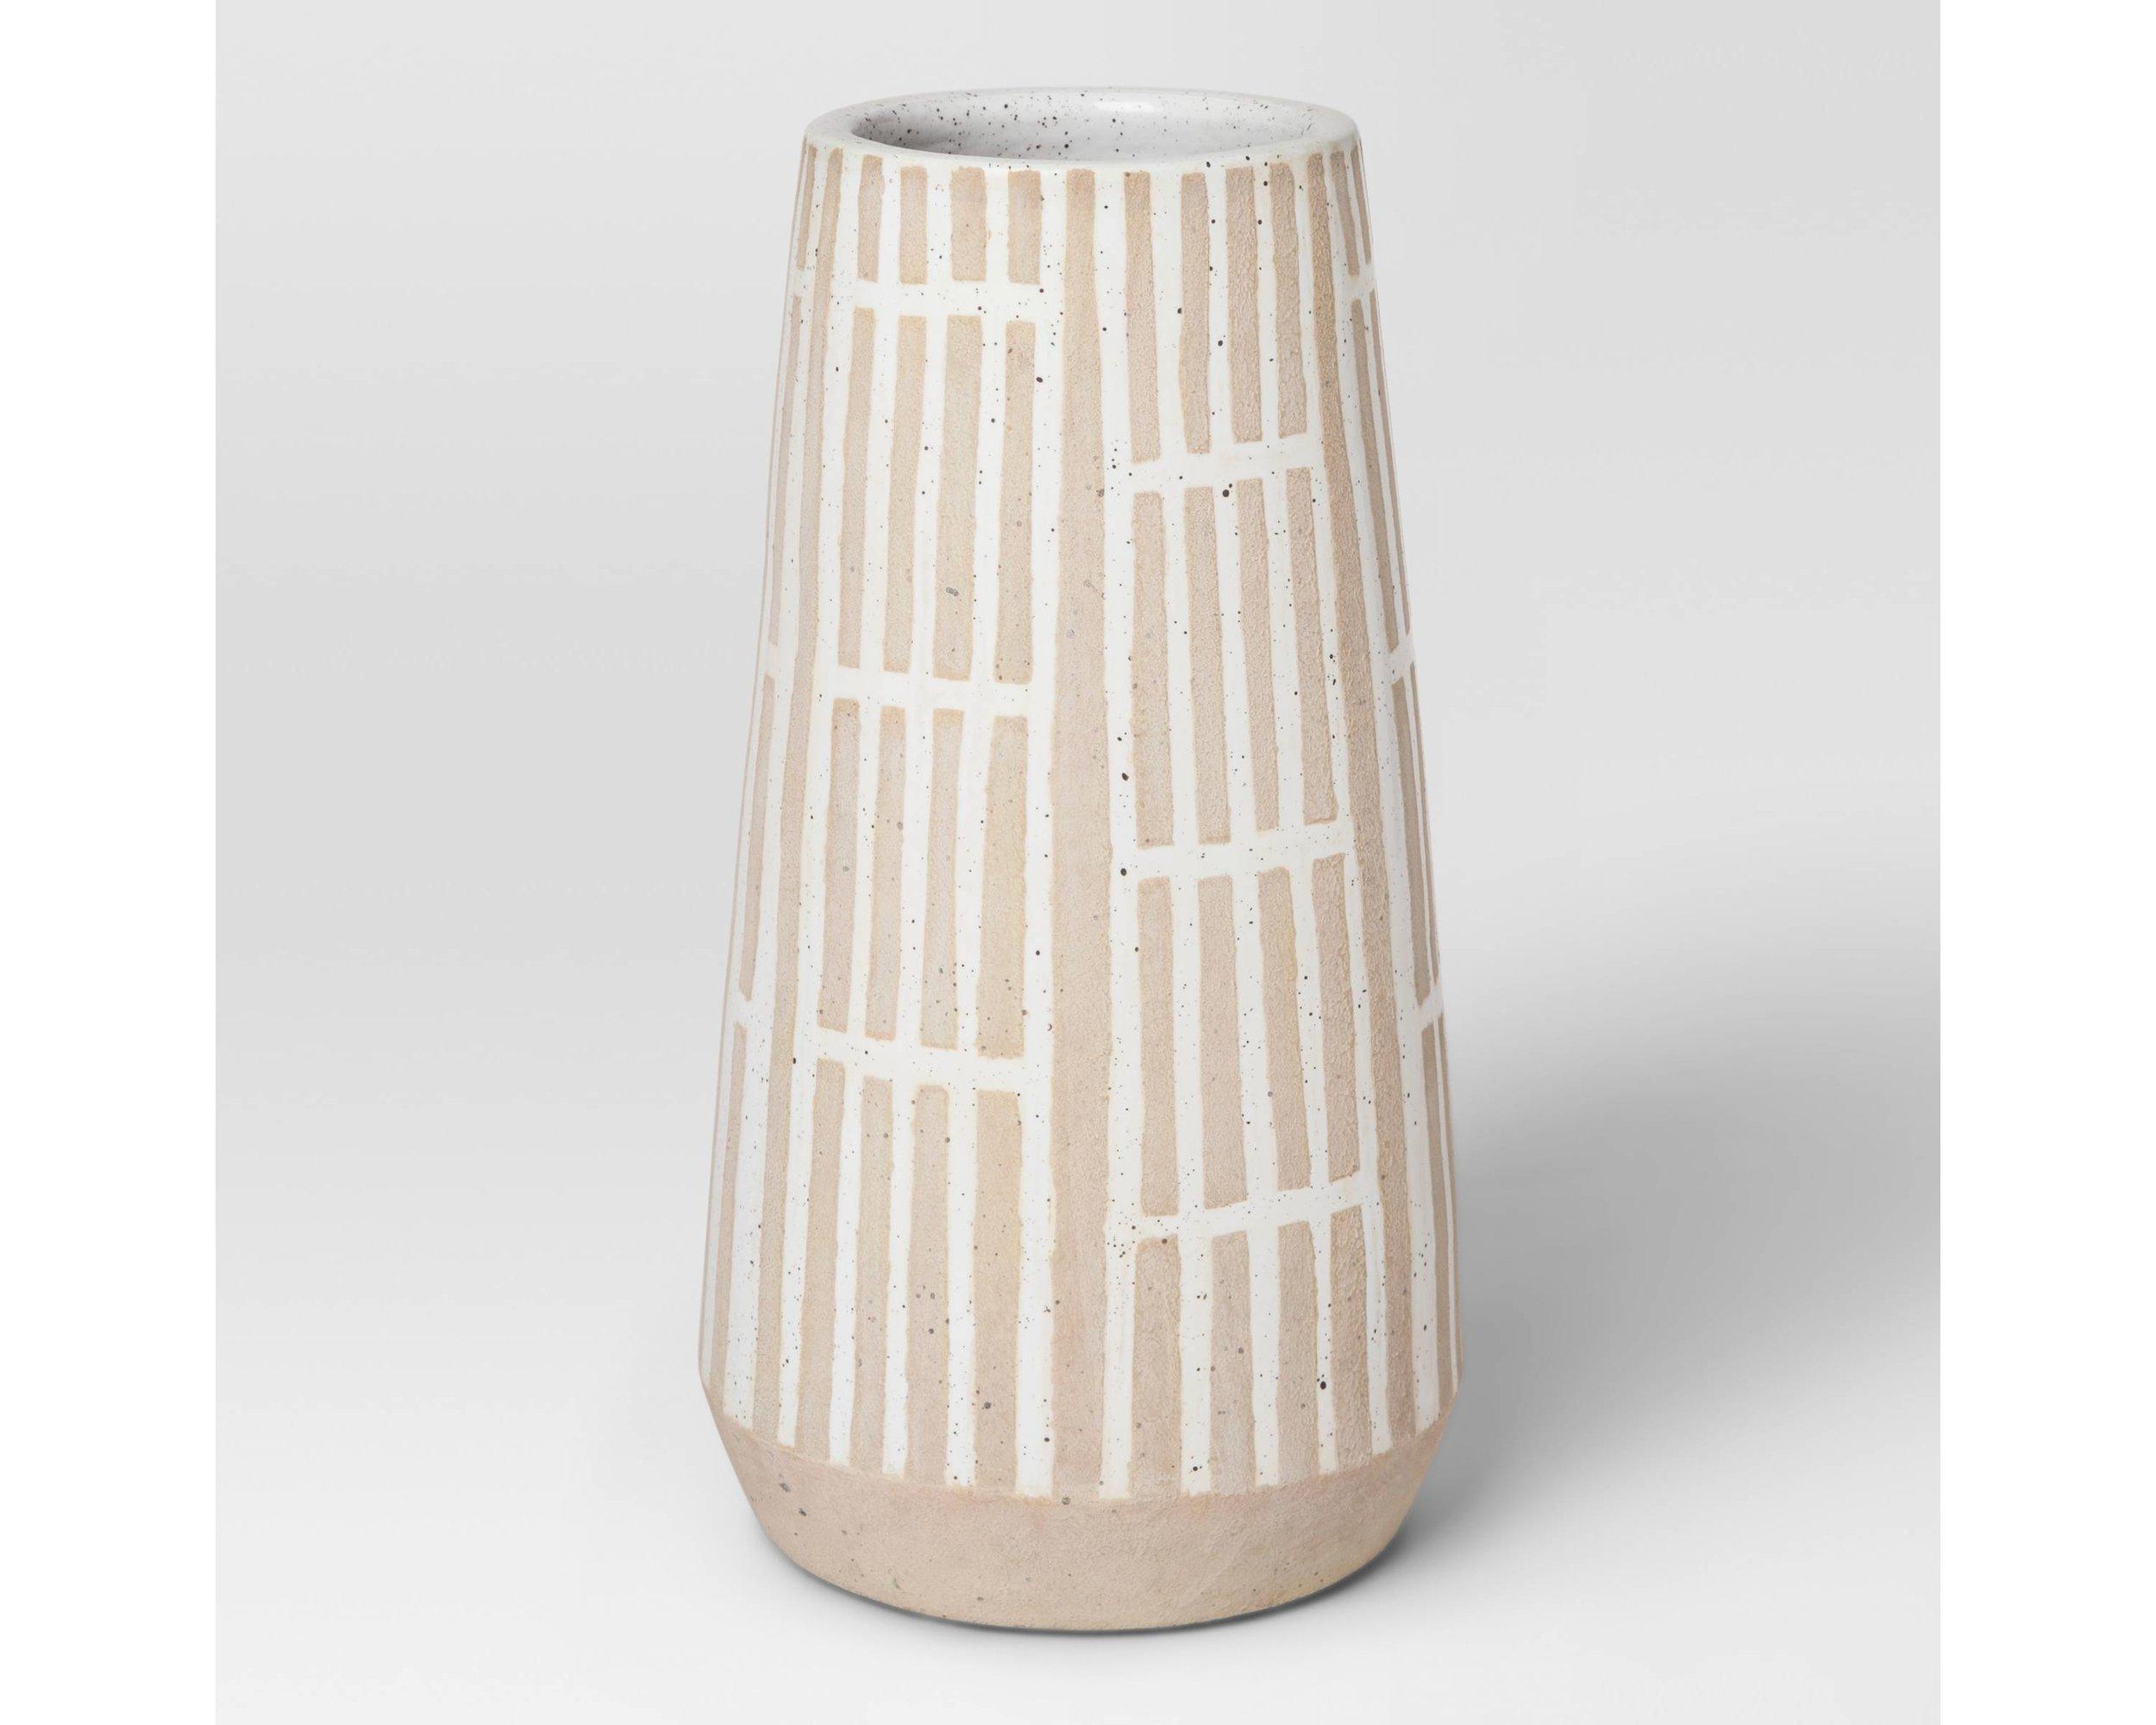 10. Modern Vase ($19)